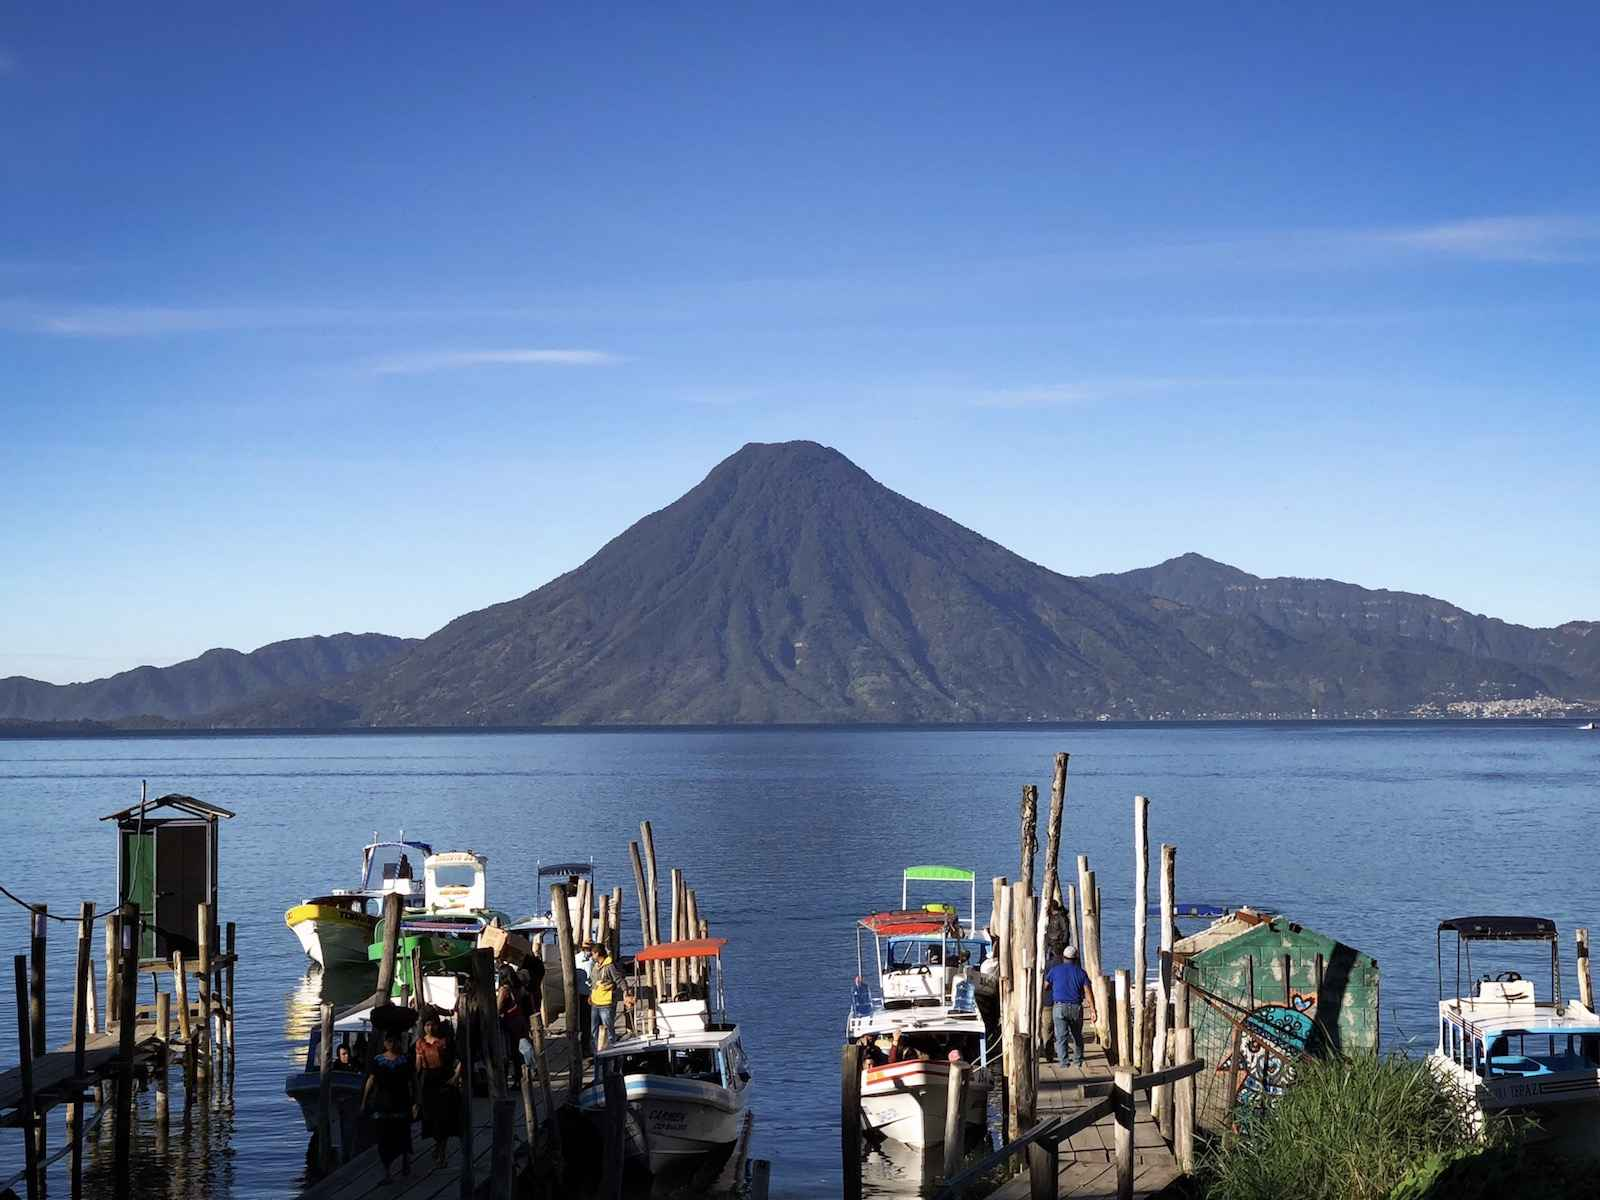 Lake Atitlan activiteiten - beklim de San Pedro vulkaan